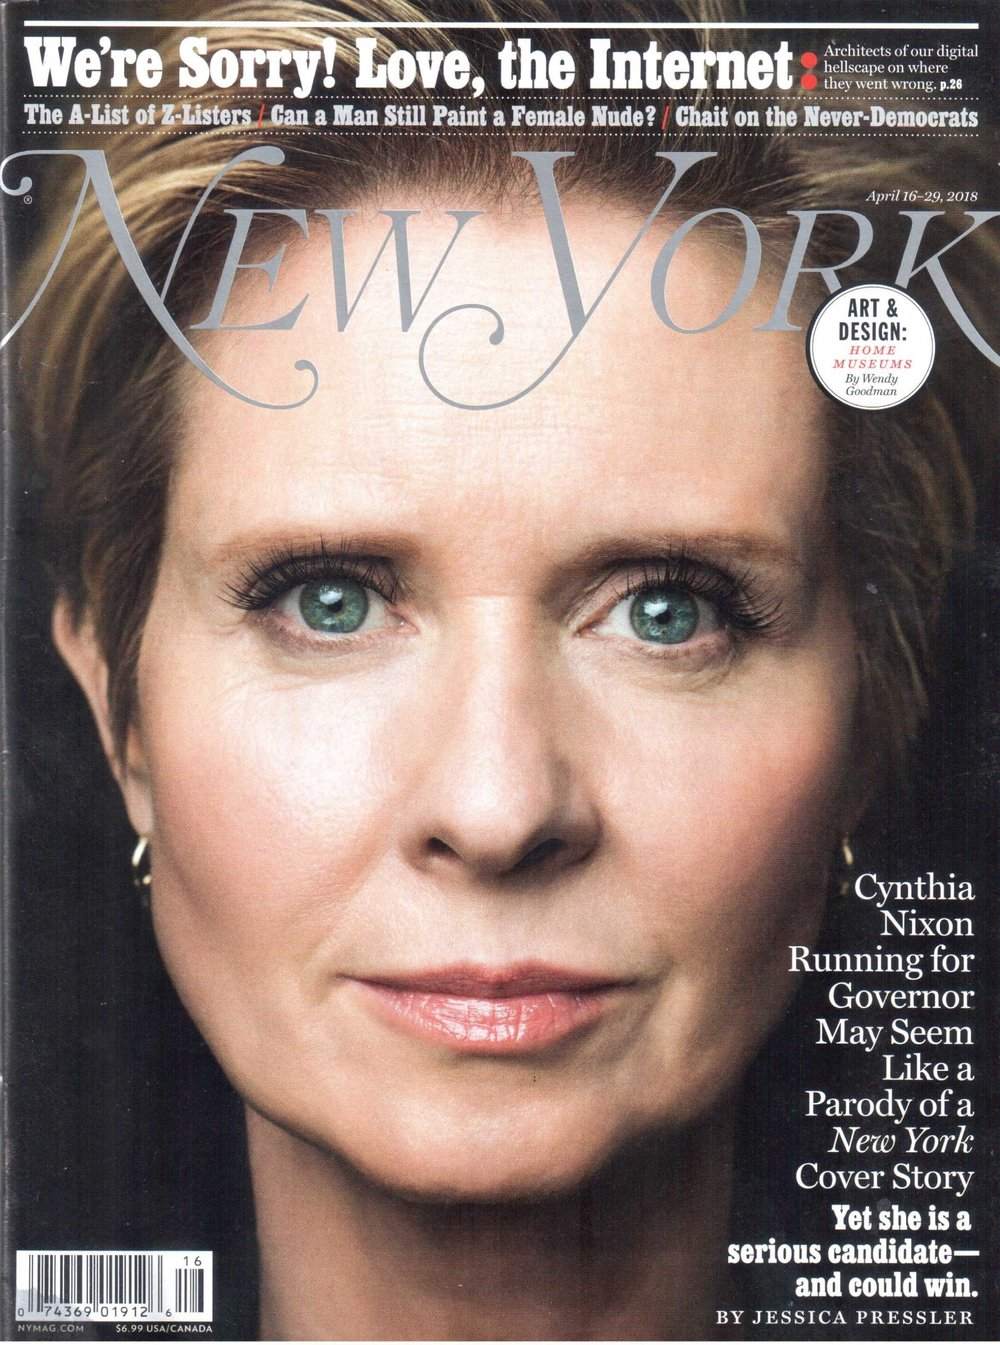 New York Magazine - Doug Meyer 2018_Page_1.jpg